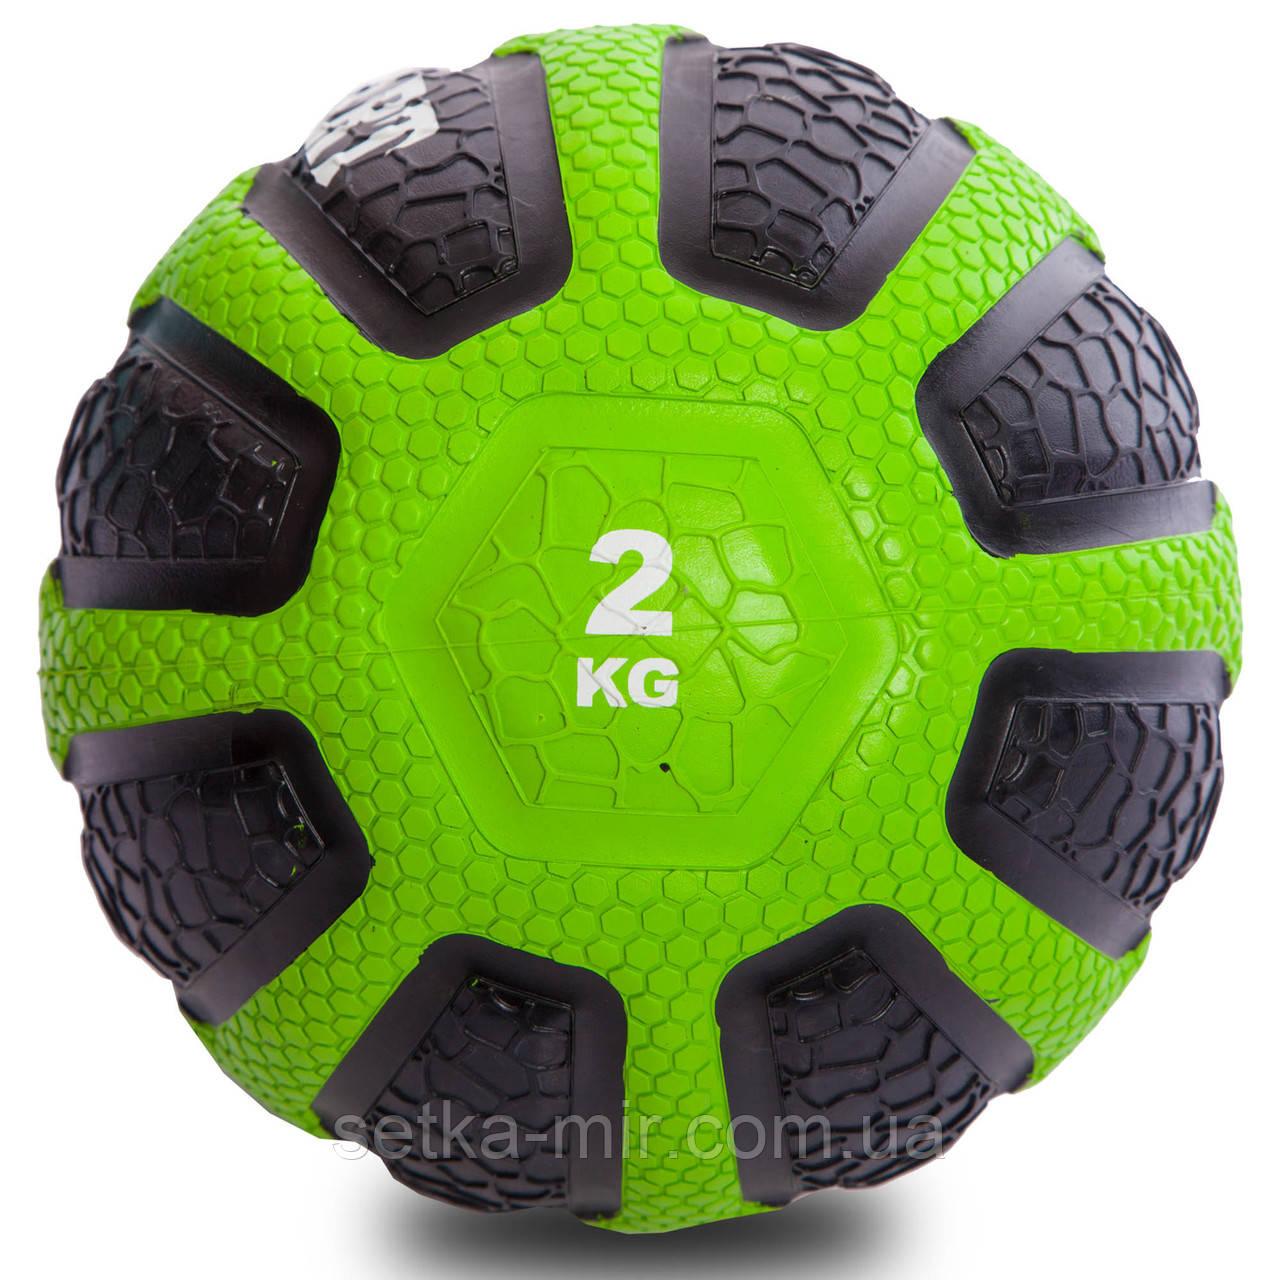 М'яч медичний медбол Zelart Medicine Ball FI-0898-2 2 кг